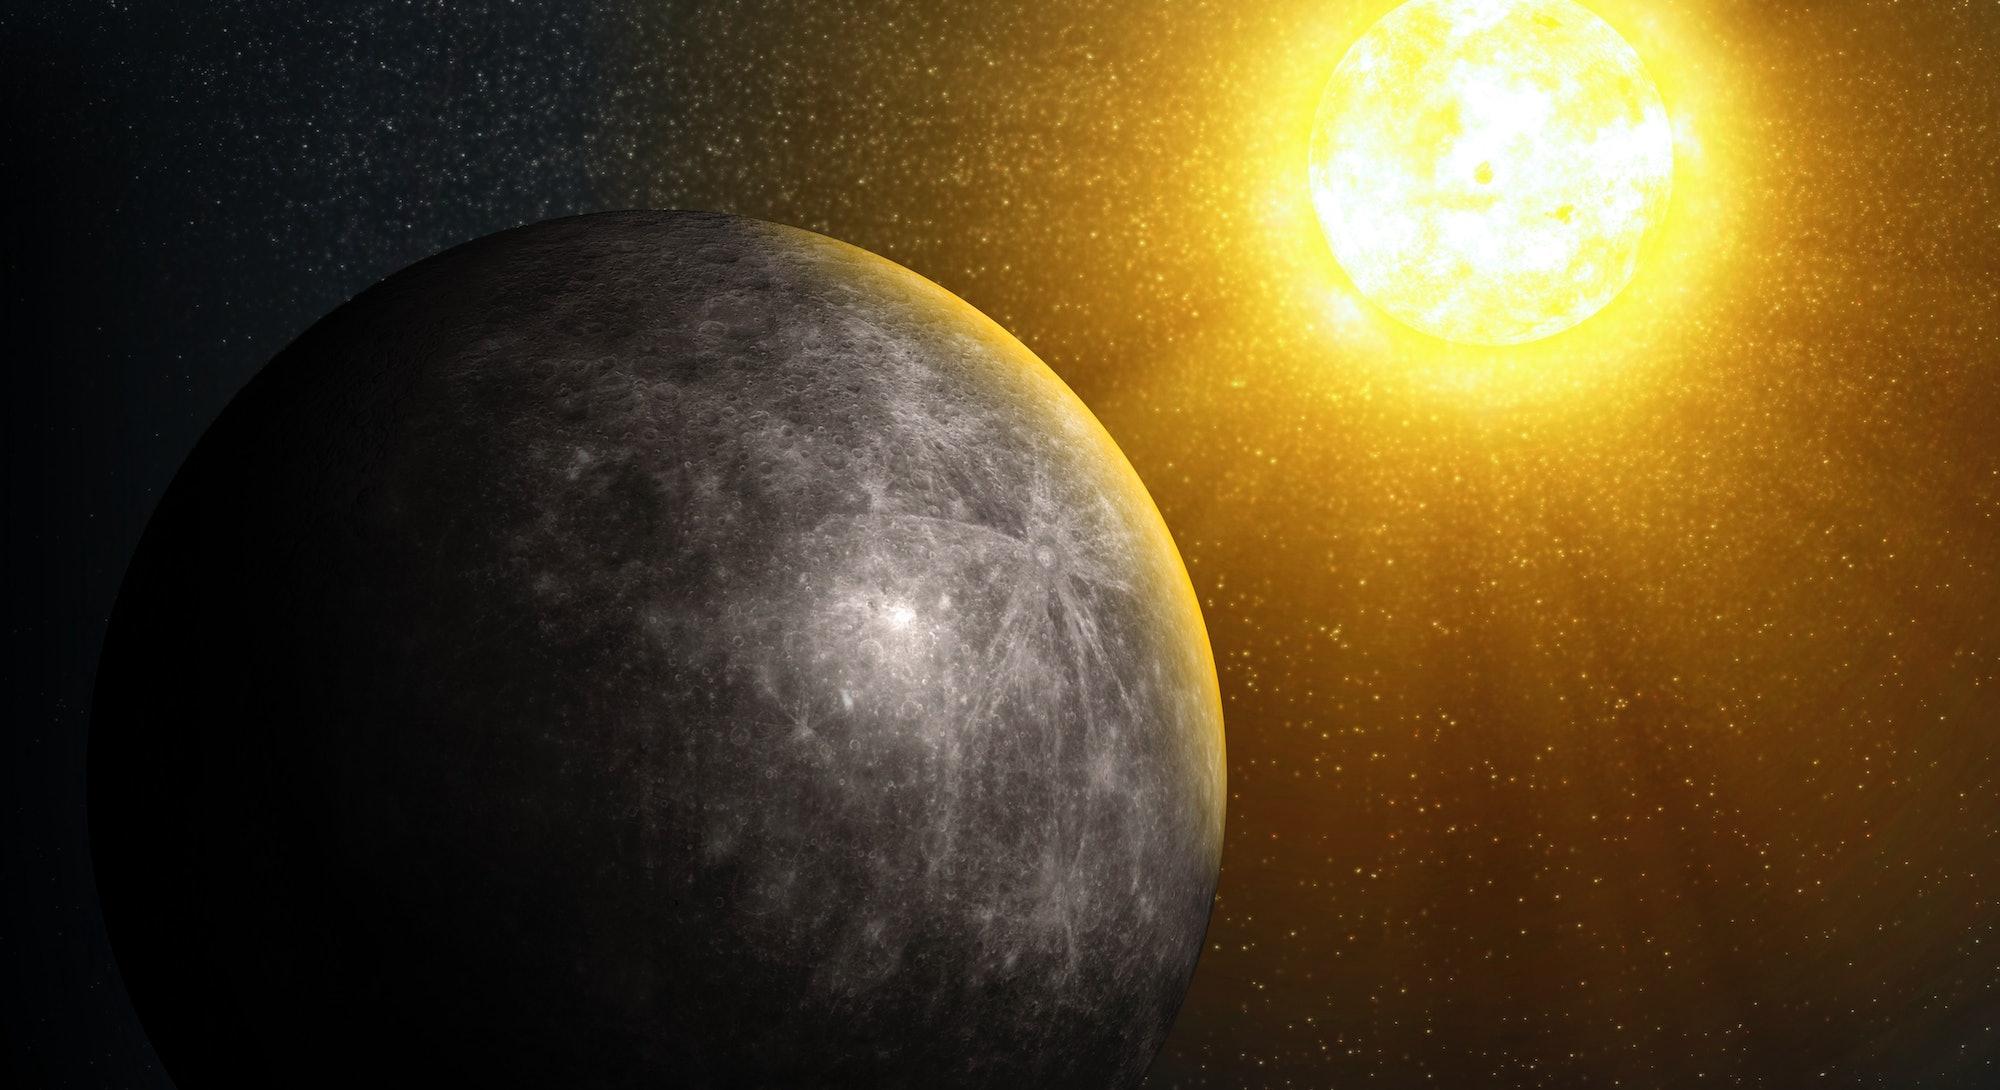 Mercury retrograde fall 2021 begins on September 27 in the sign of Libra